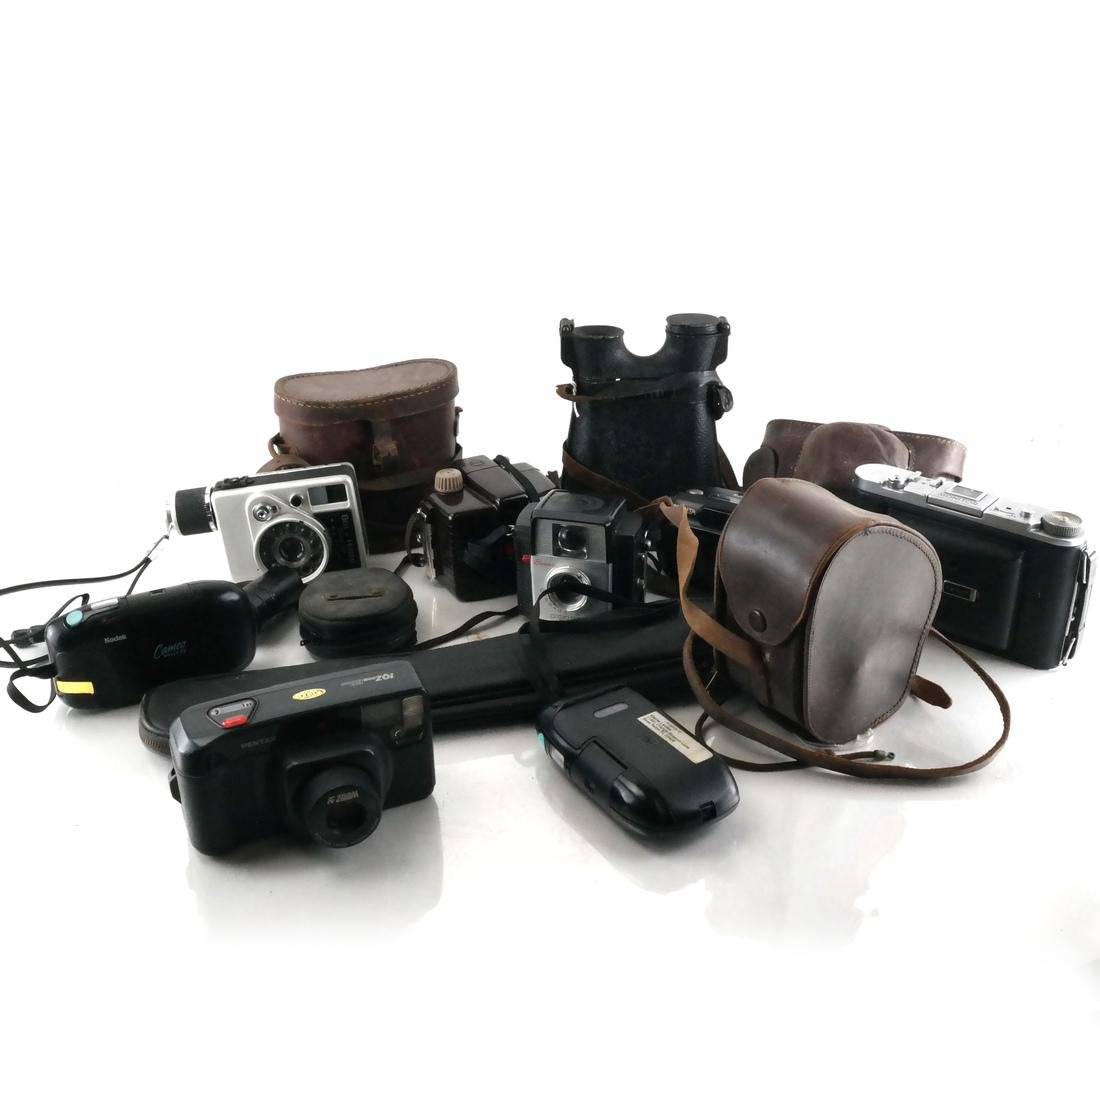 Lot of Camera Equipment